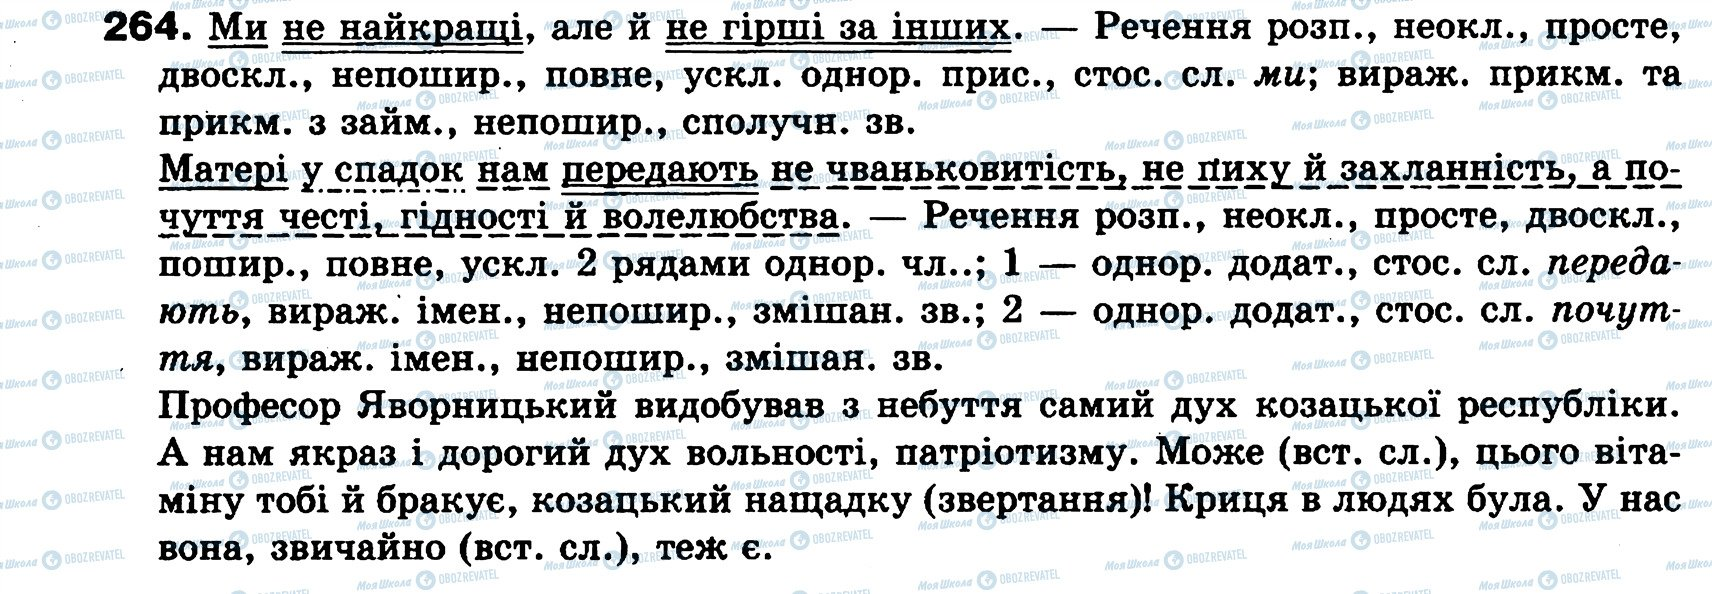 ГДЗ Укр мова 8 класс страница 264